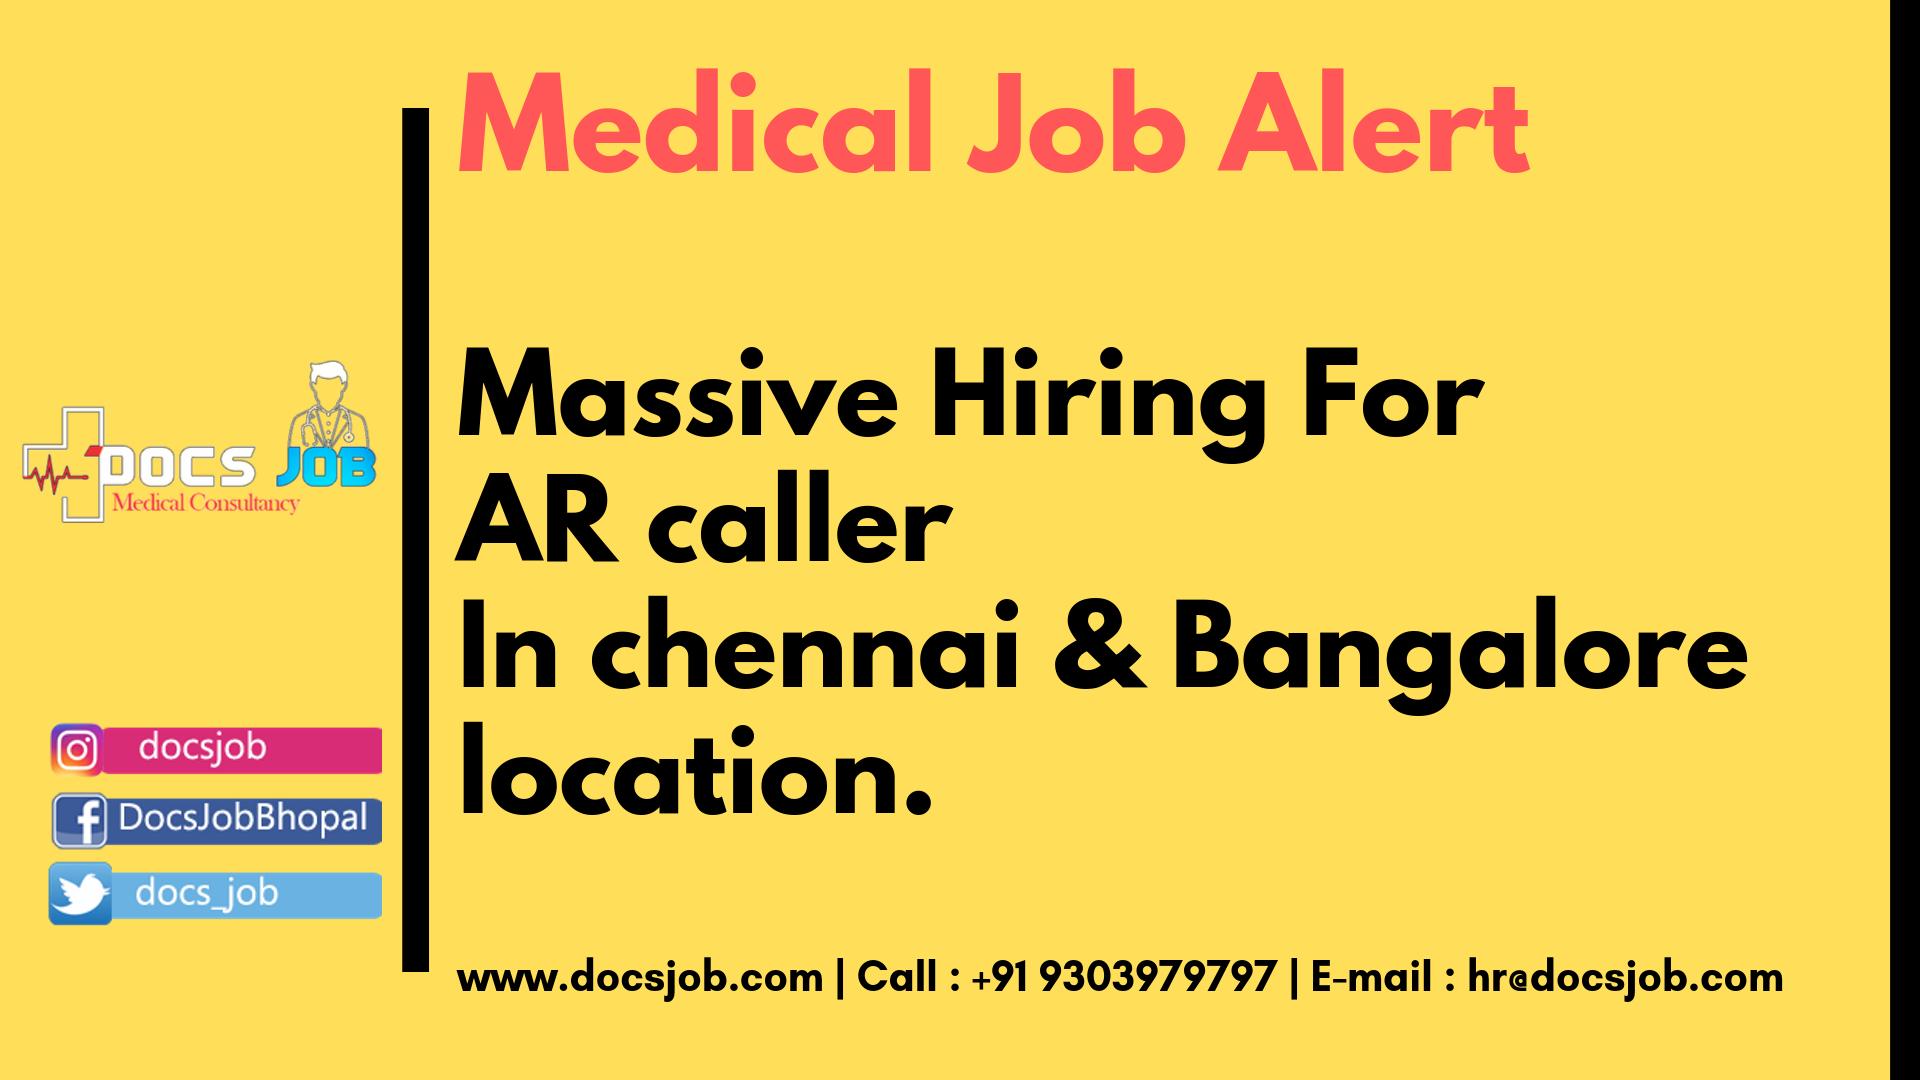 Massive Hiring For AR caller In Chennai & Bangalore